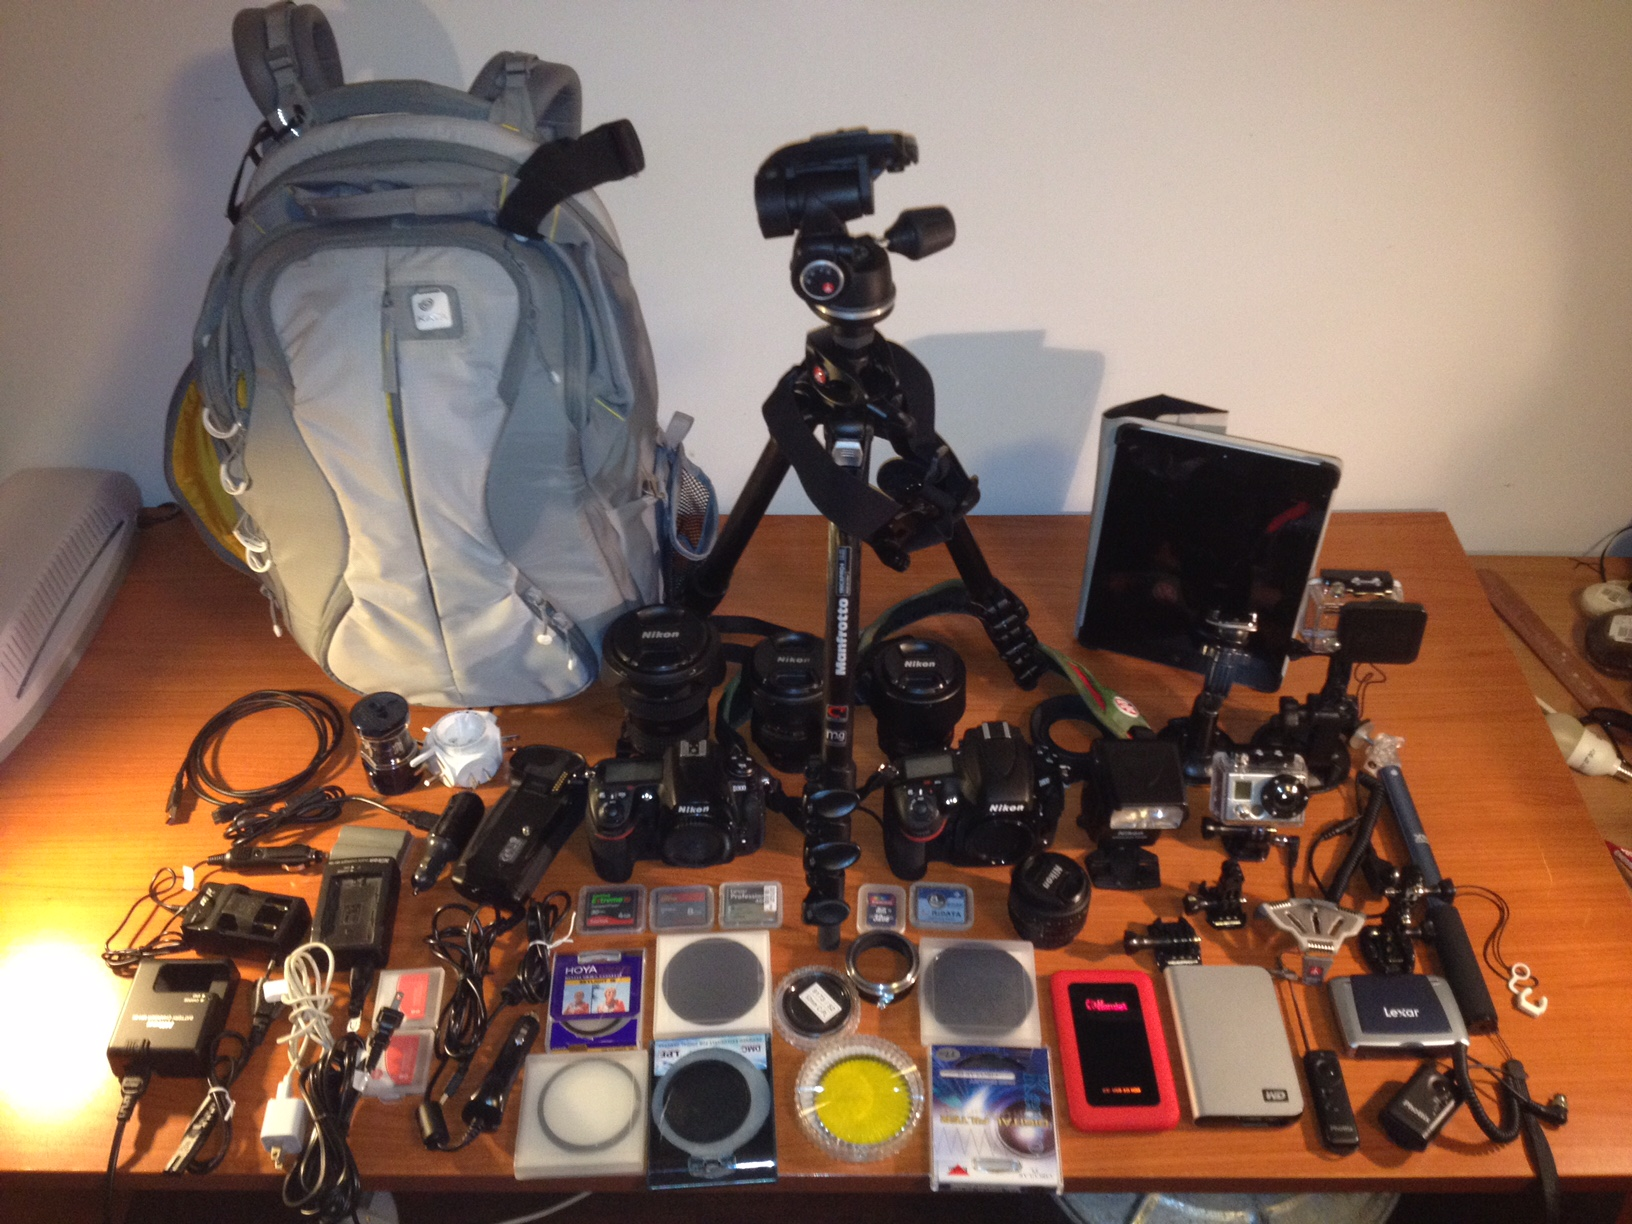 Attrezzatura: My Photo gear on a bench